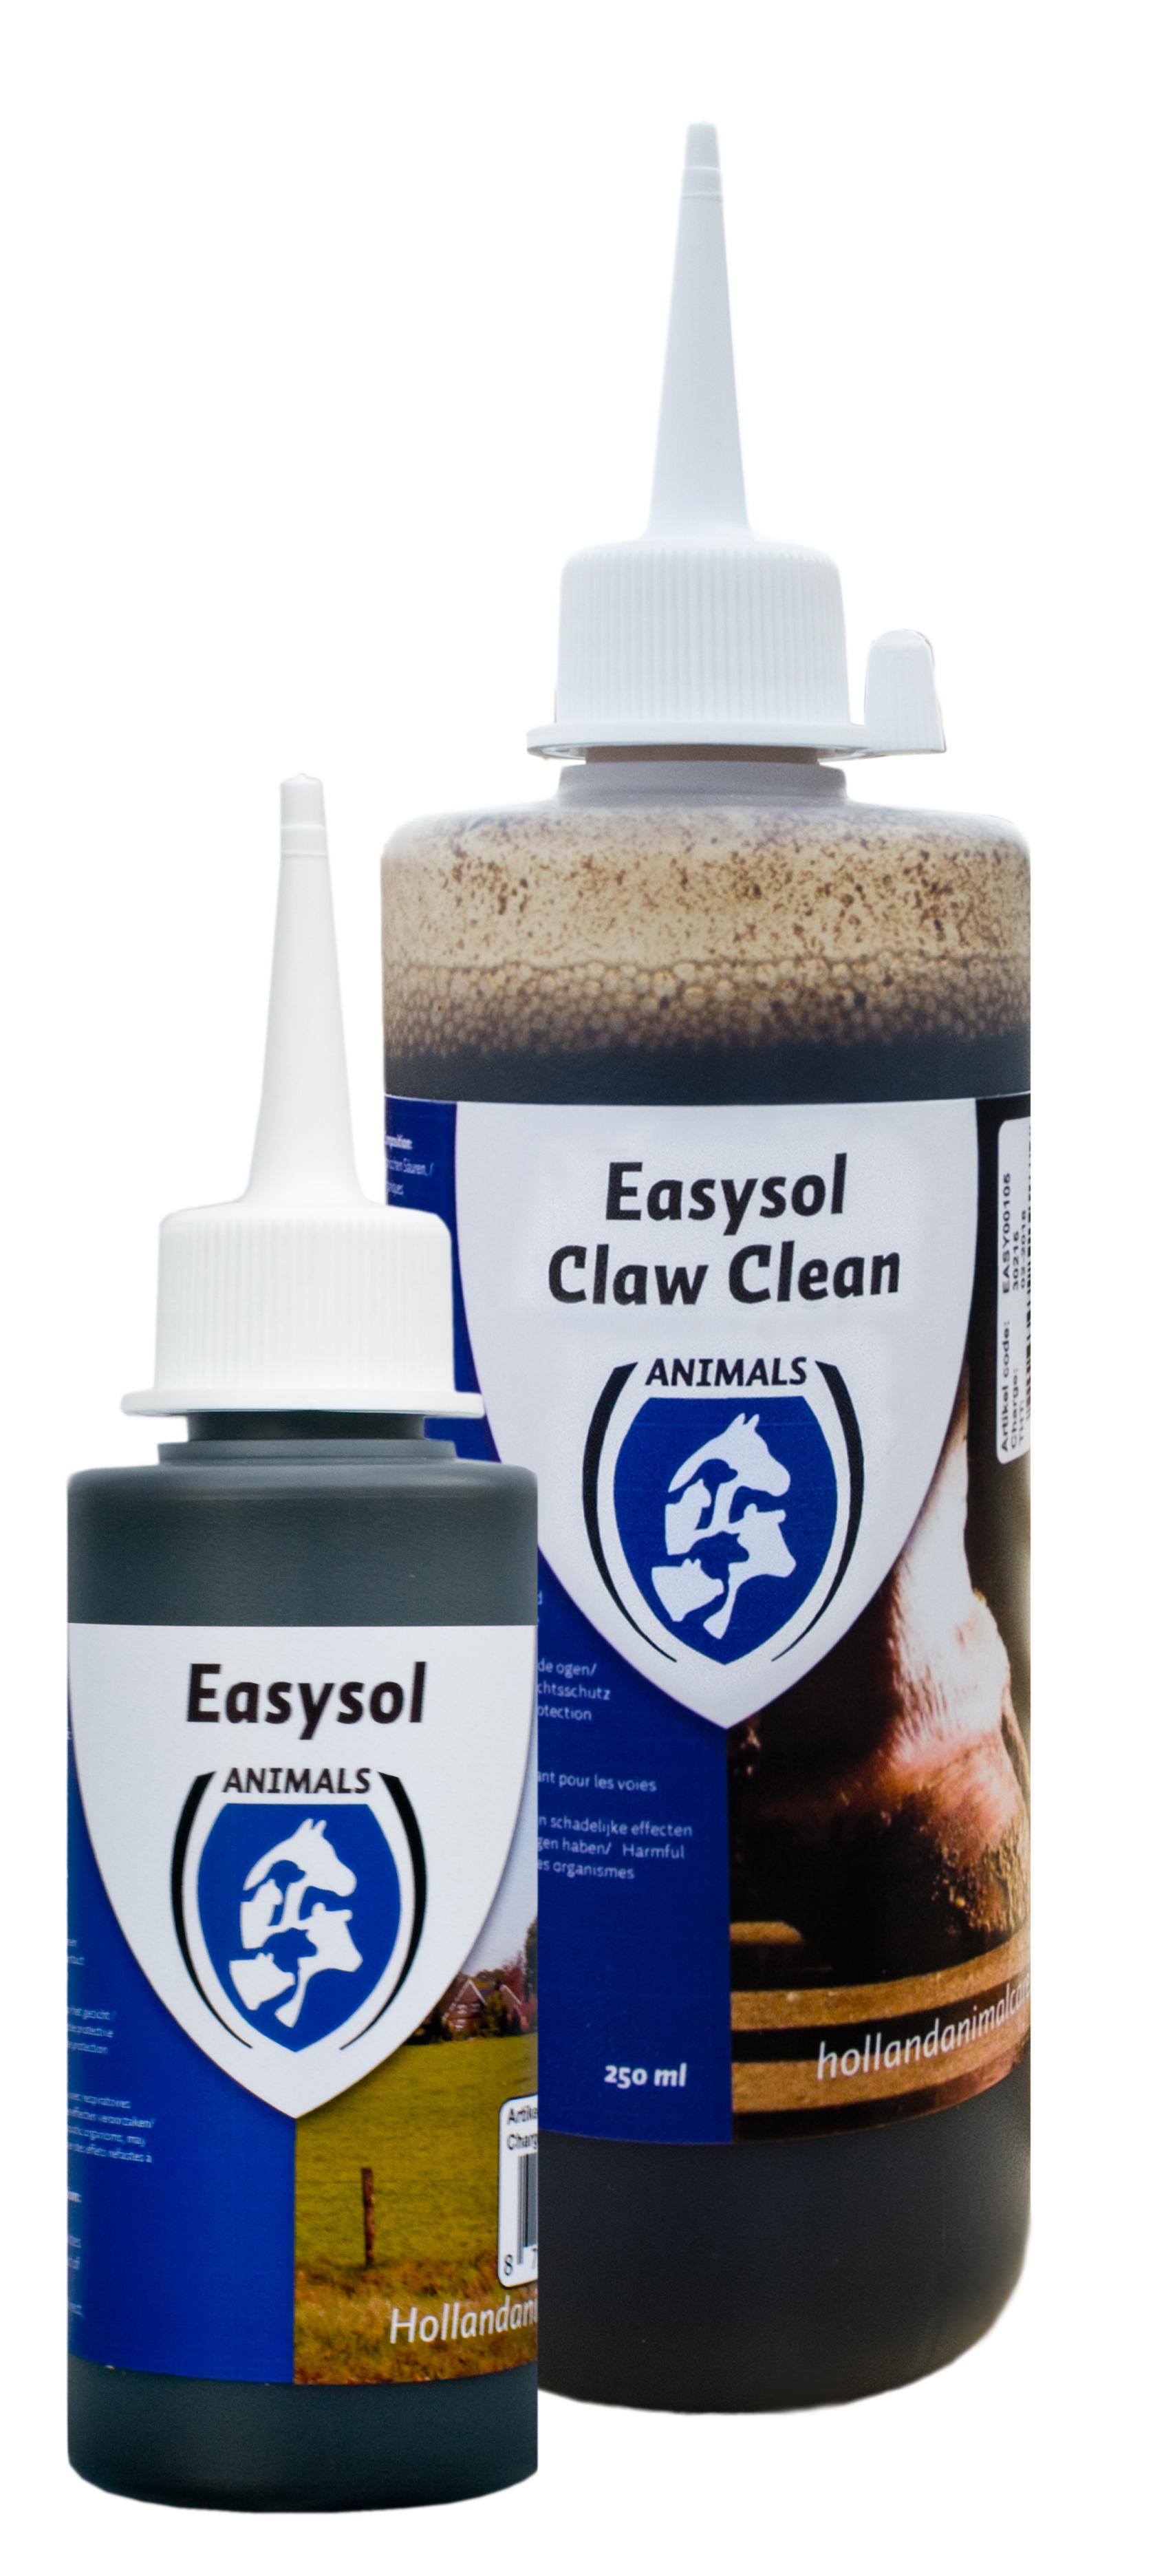 Easysol claw clean